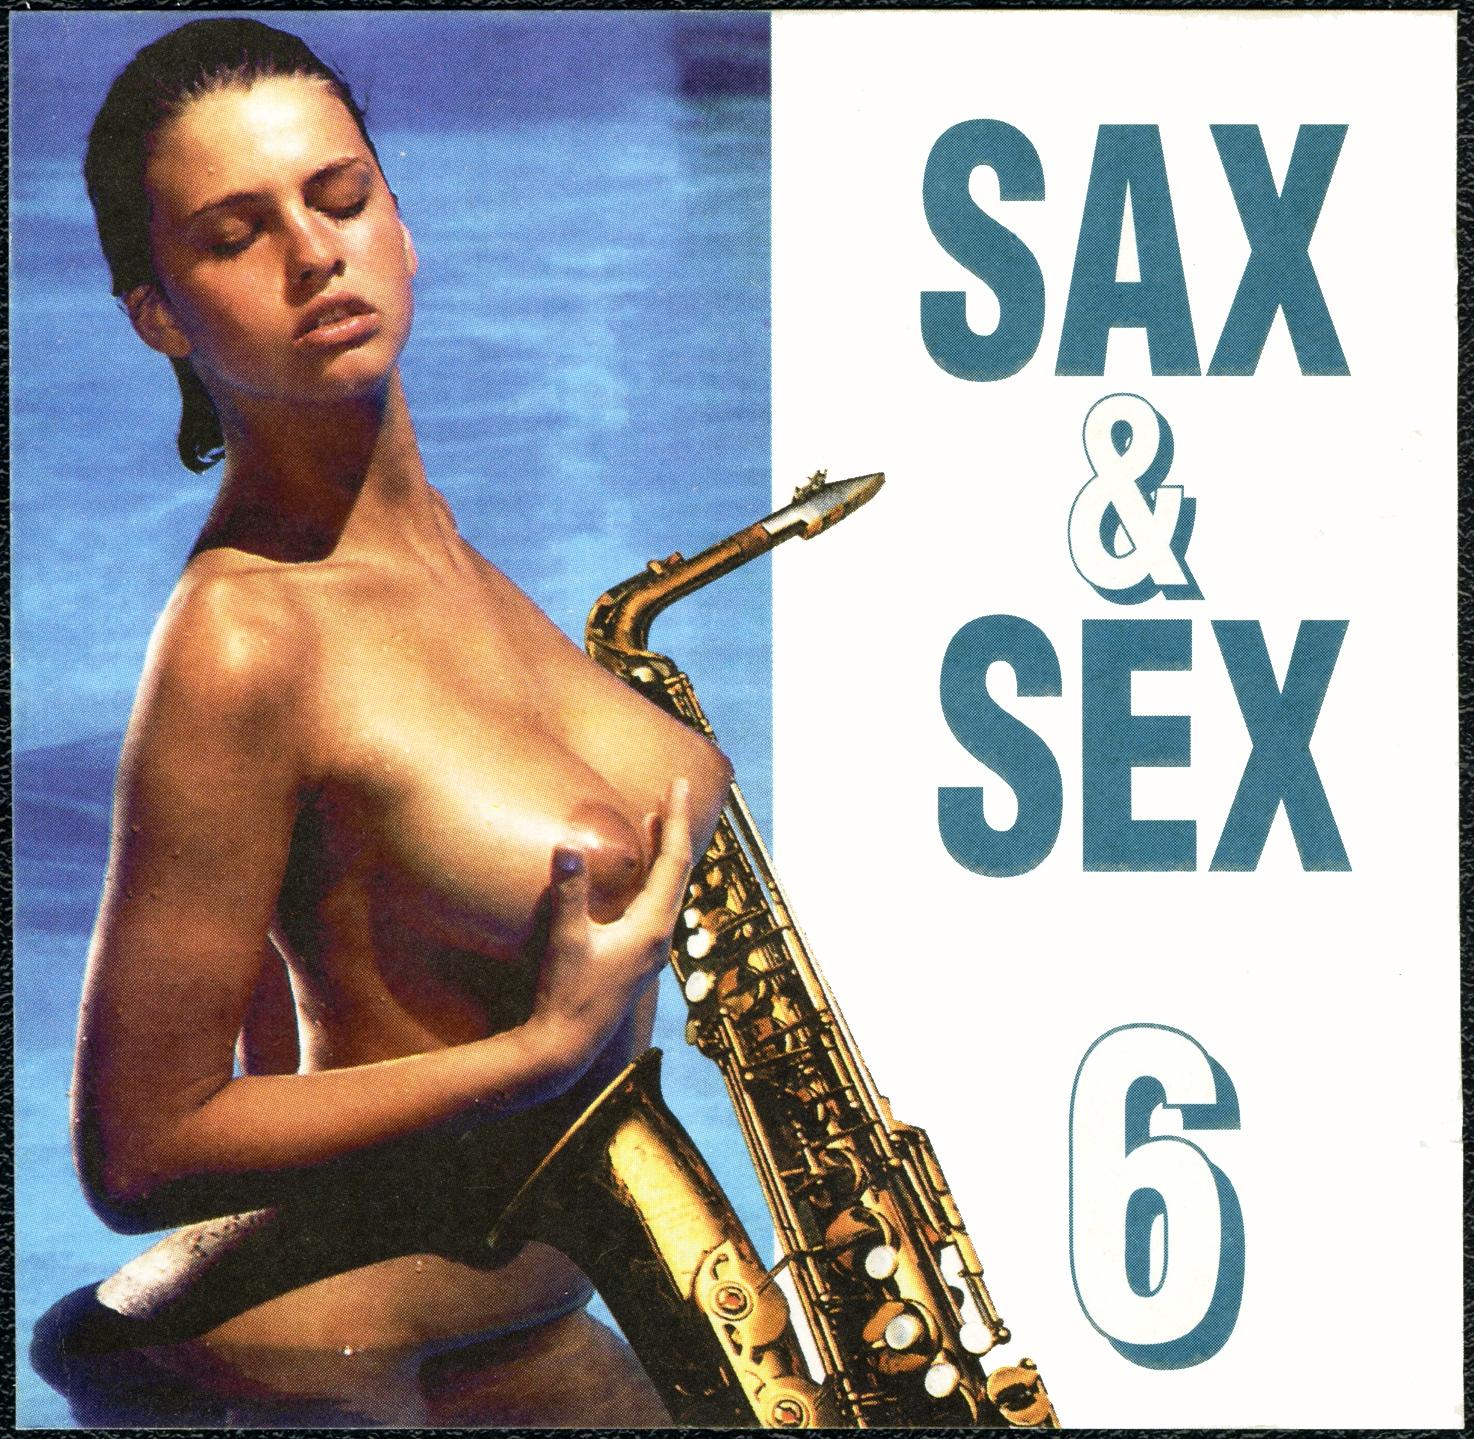 Jngle woman vs man full sax porn image